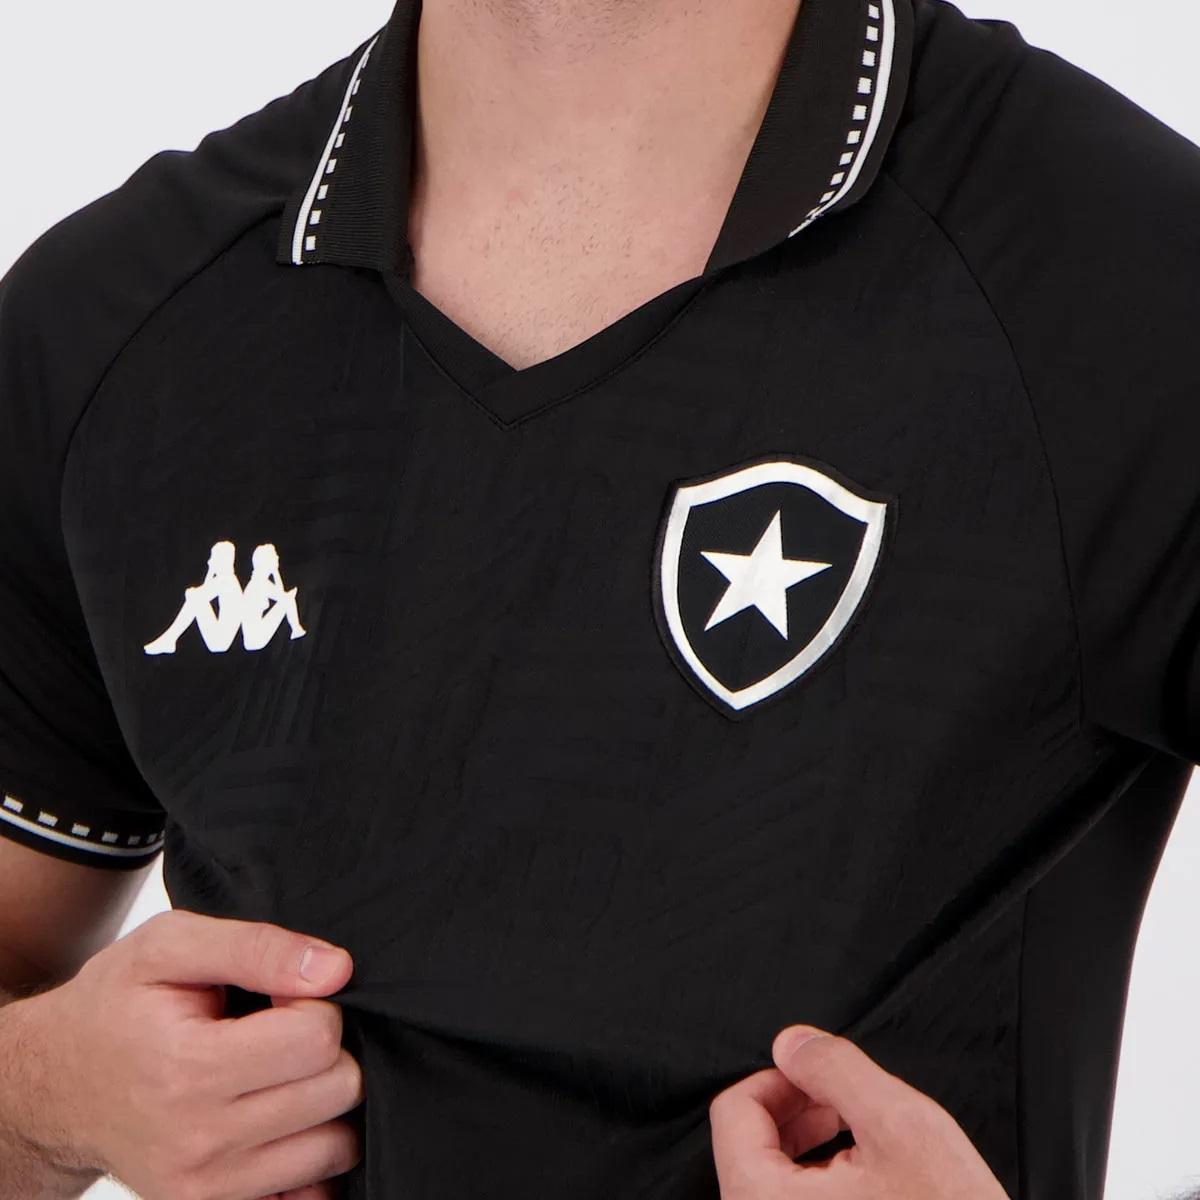 Camisa Kappa Botafogo Kombat Away II Player 2021 Masculina - Plus Size Preta